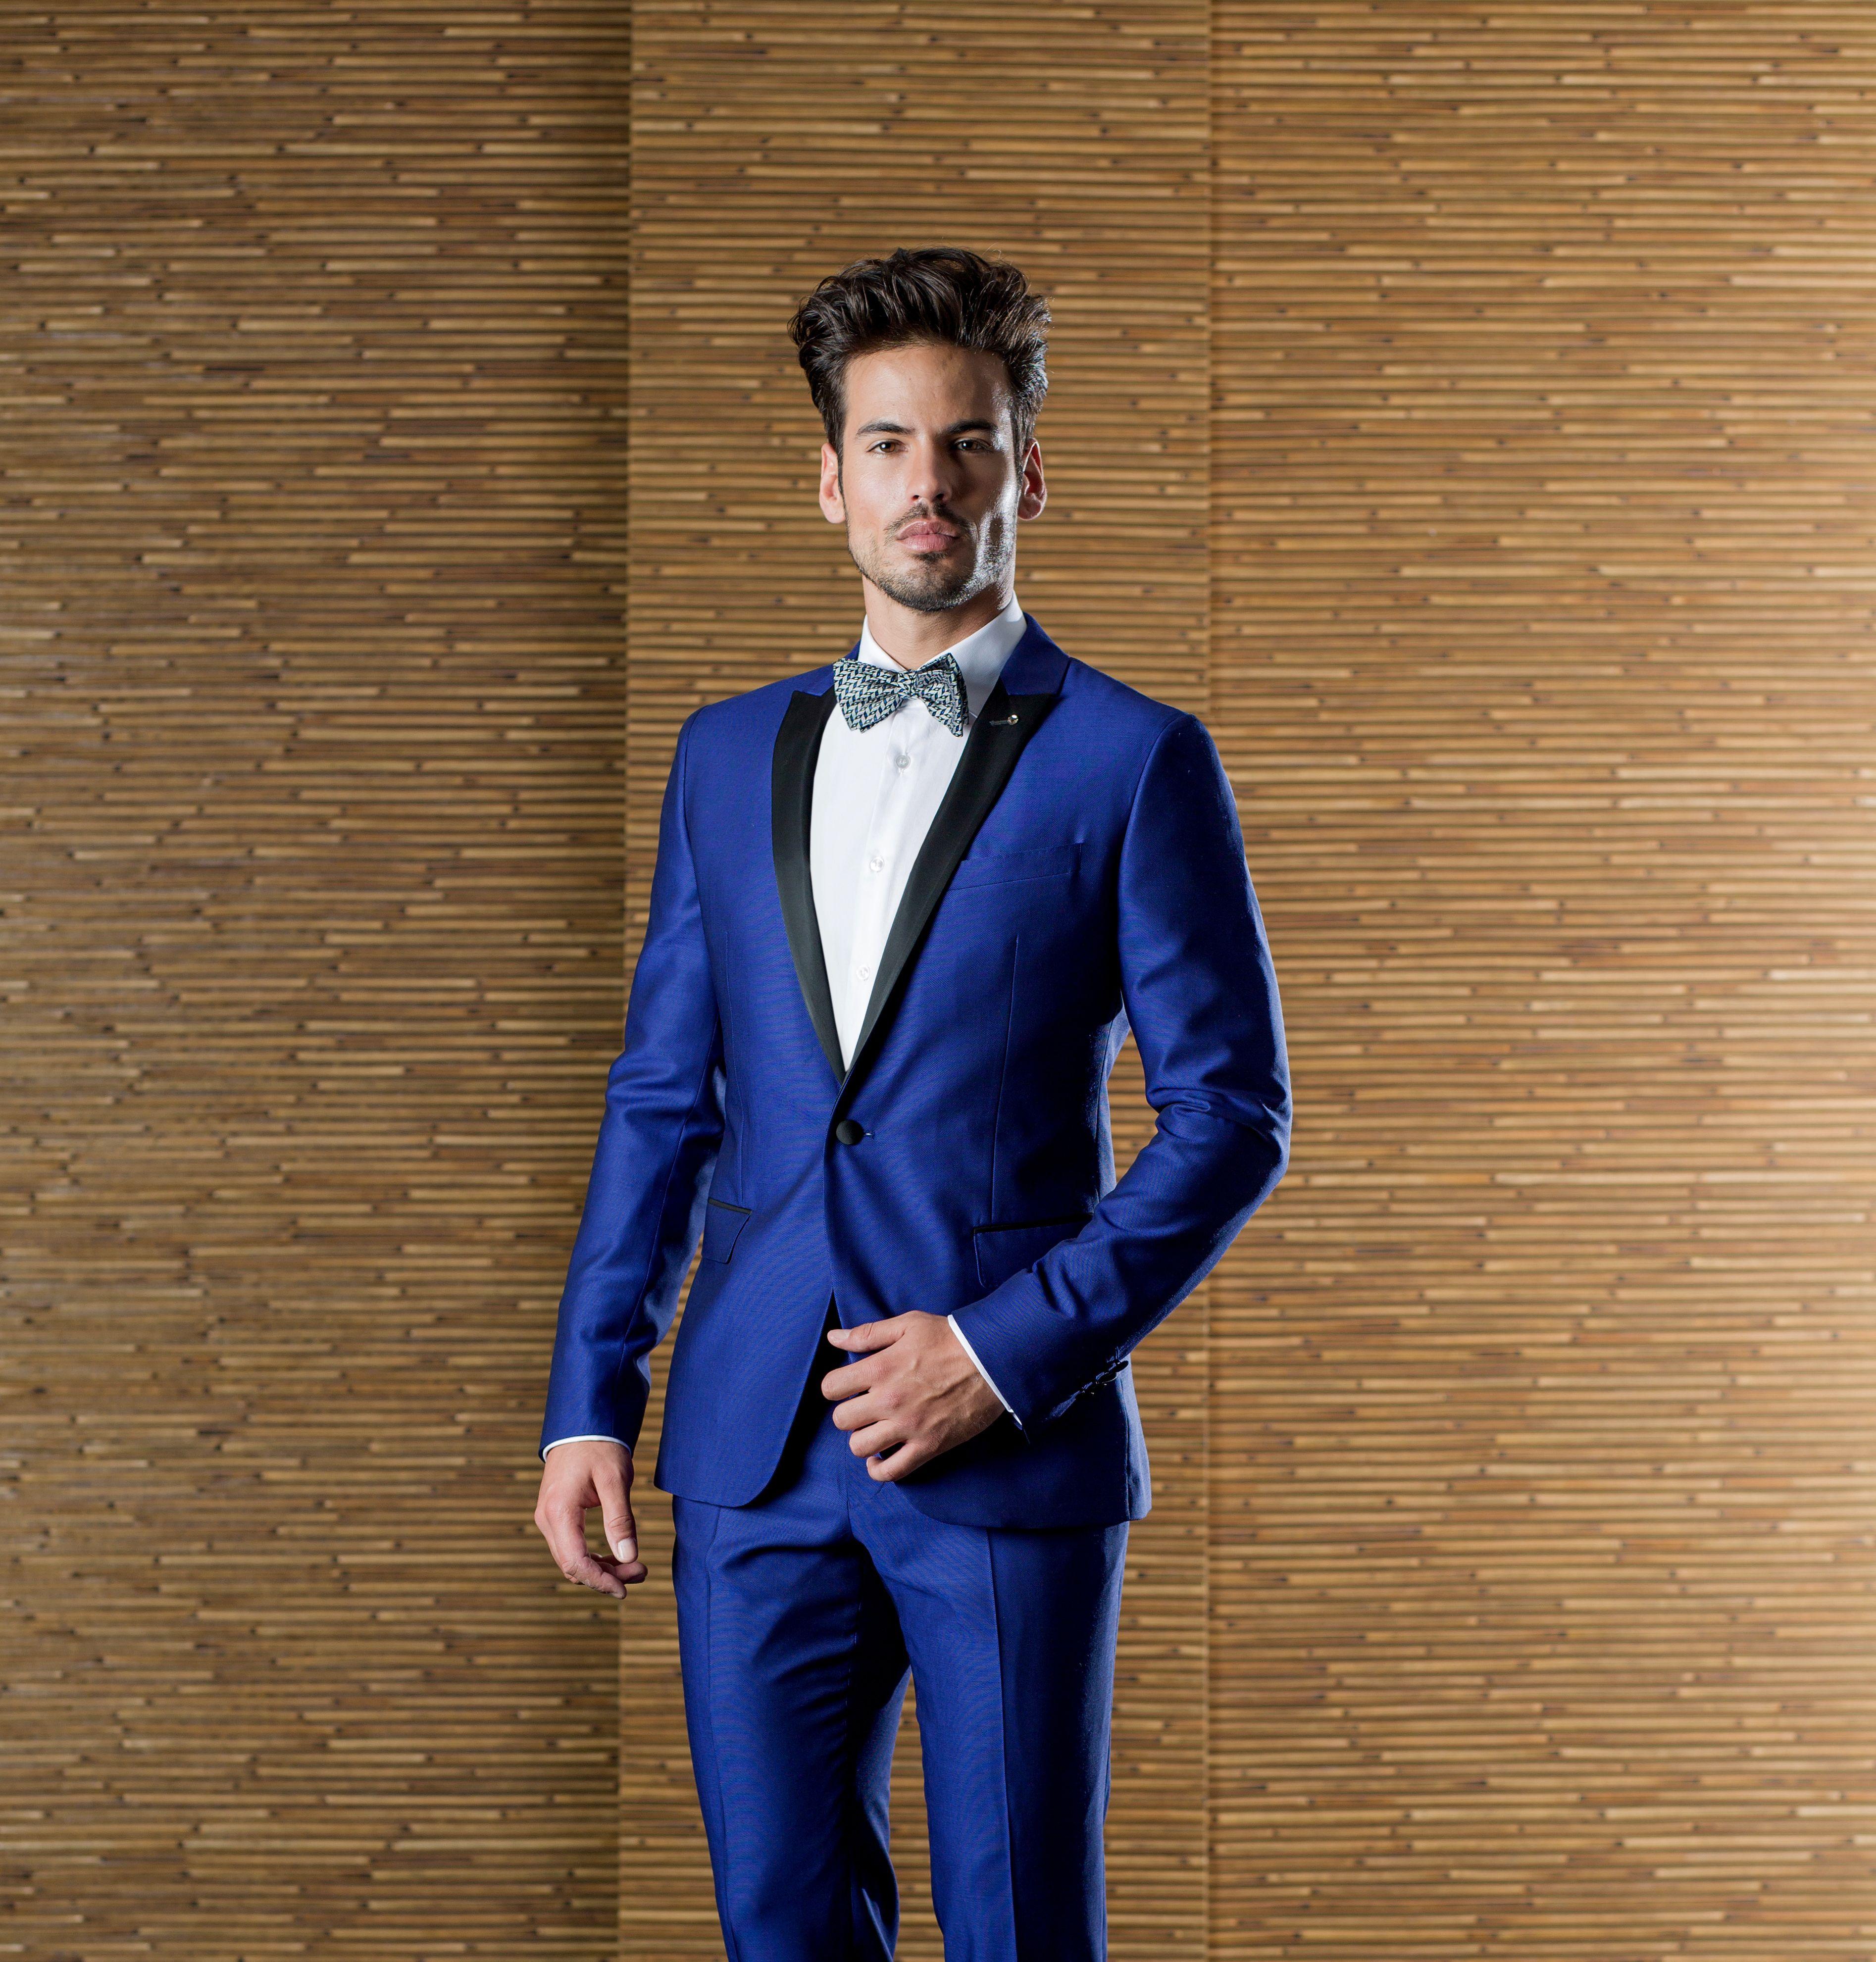 e5f6b5bf3925 Smoking azul Klein satinado con solapa en raso negro y pajarita ...